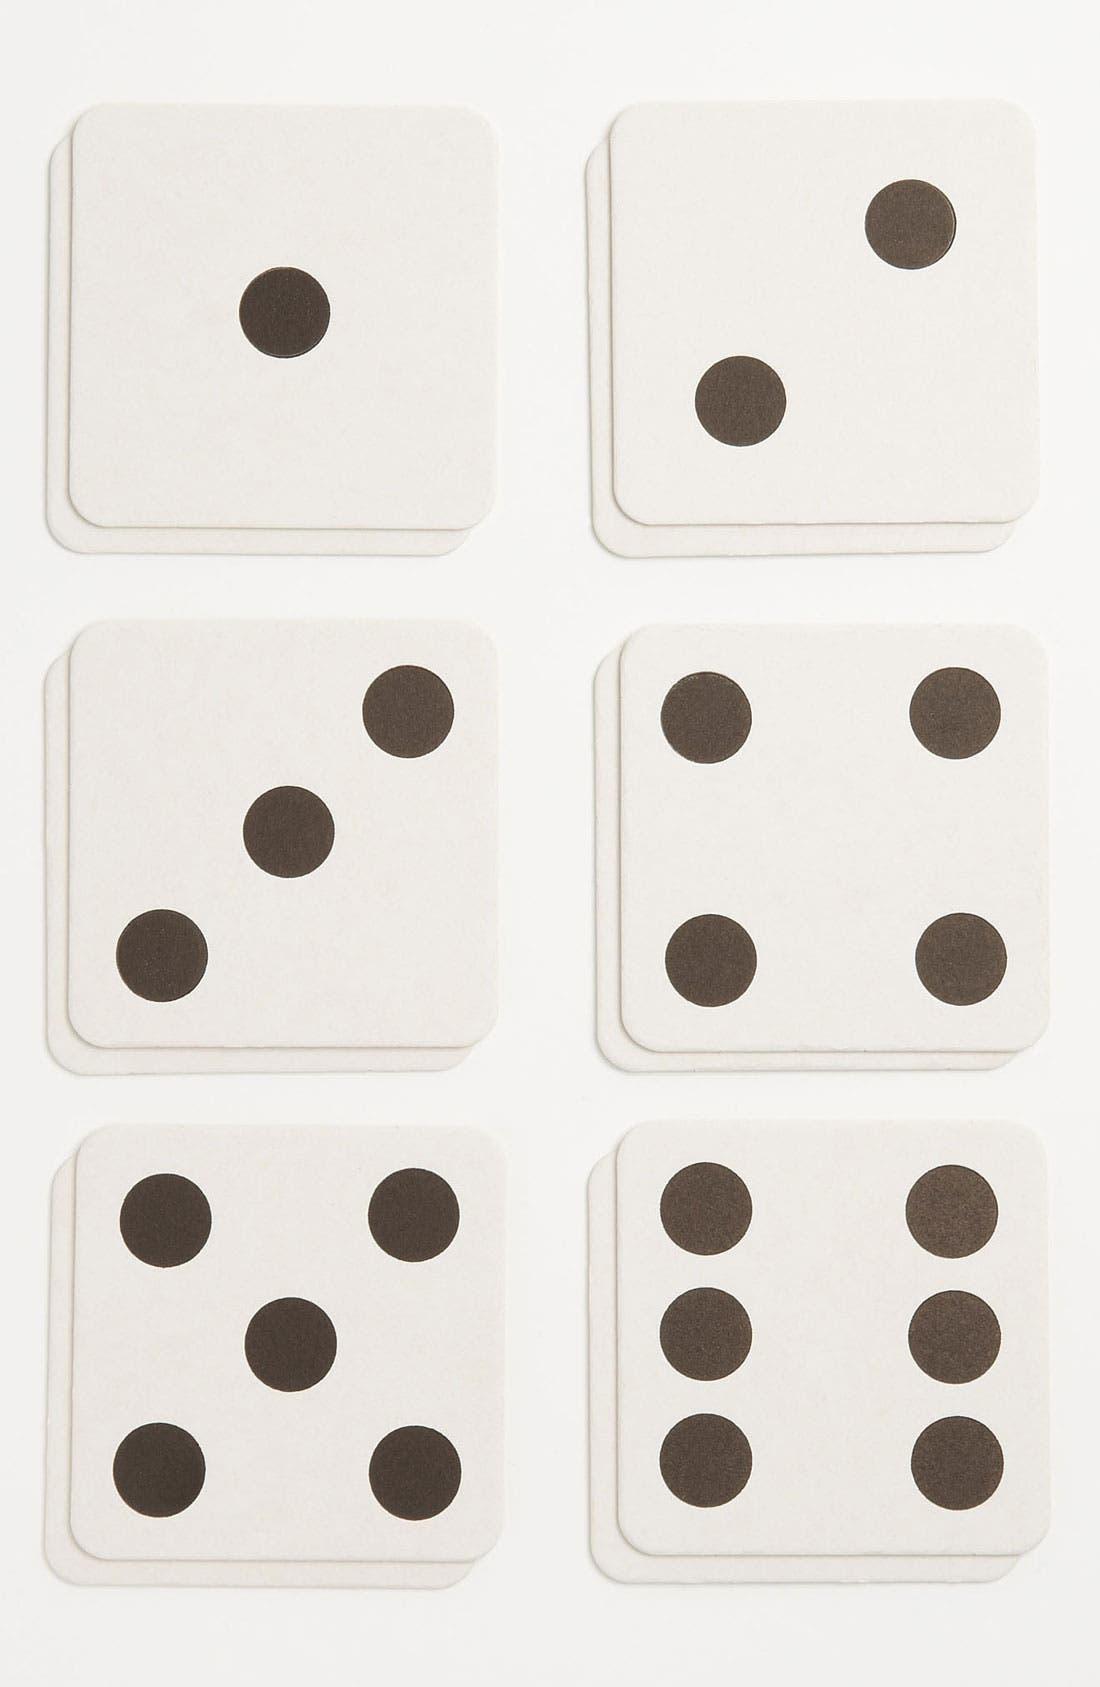 Main Image - 'Dice' Coasters (Set of 10)